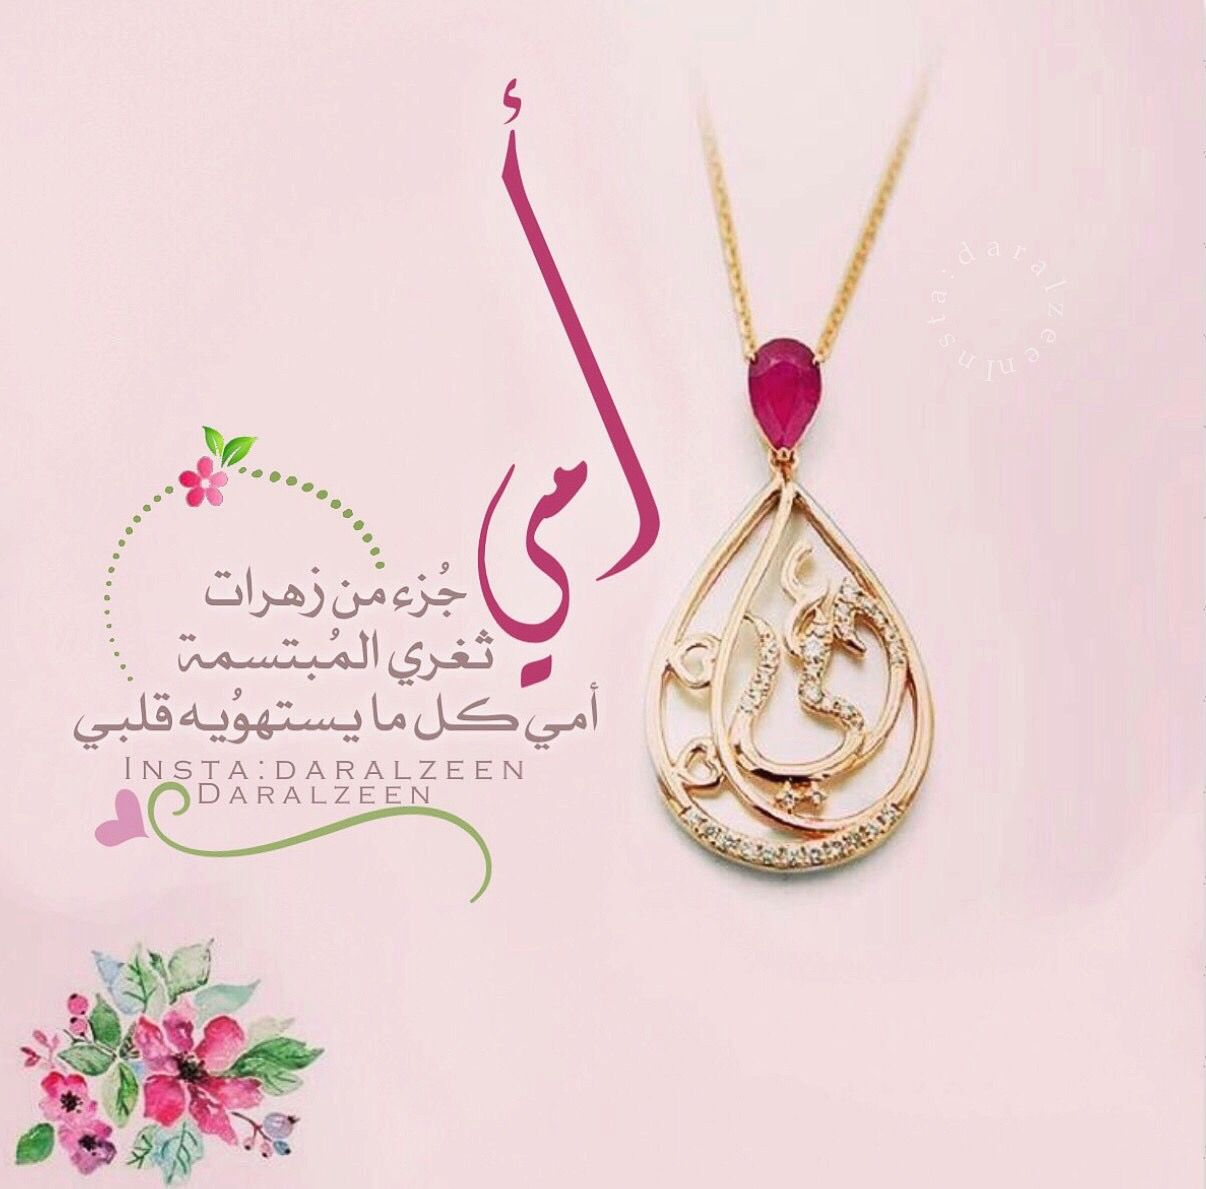 أمي جنتي Islamic Art Calligraphy Its Friday Quotes Mom And Dad